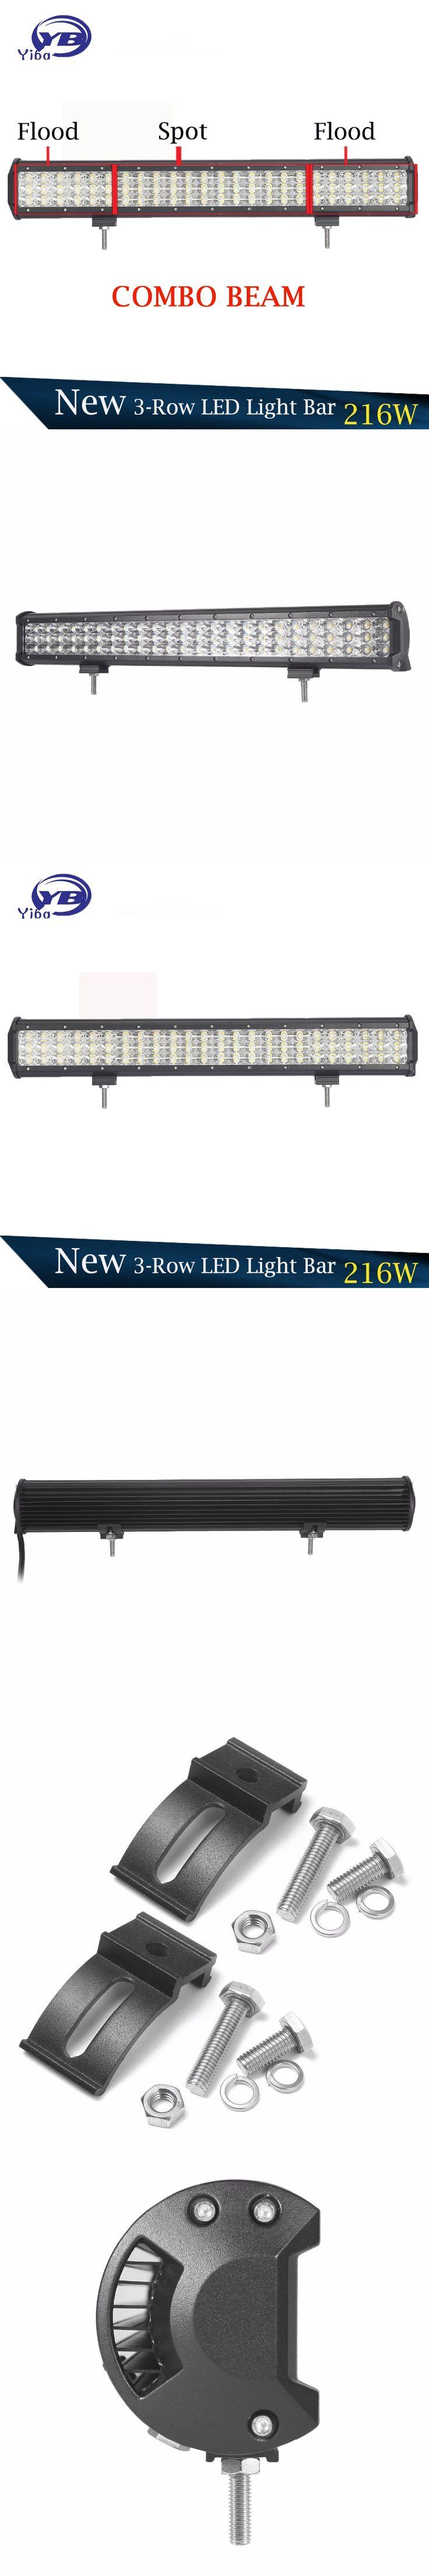 23inch 216w 6D 3-Row LED Light Bar 4X4 car Off road LED Light Bar IP67 waterproof Combo Beam offroad LED light bar for truck